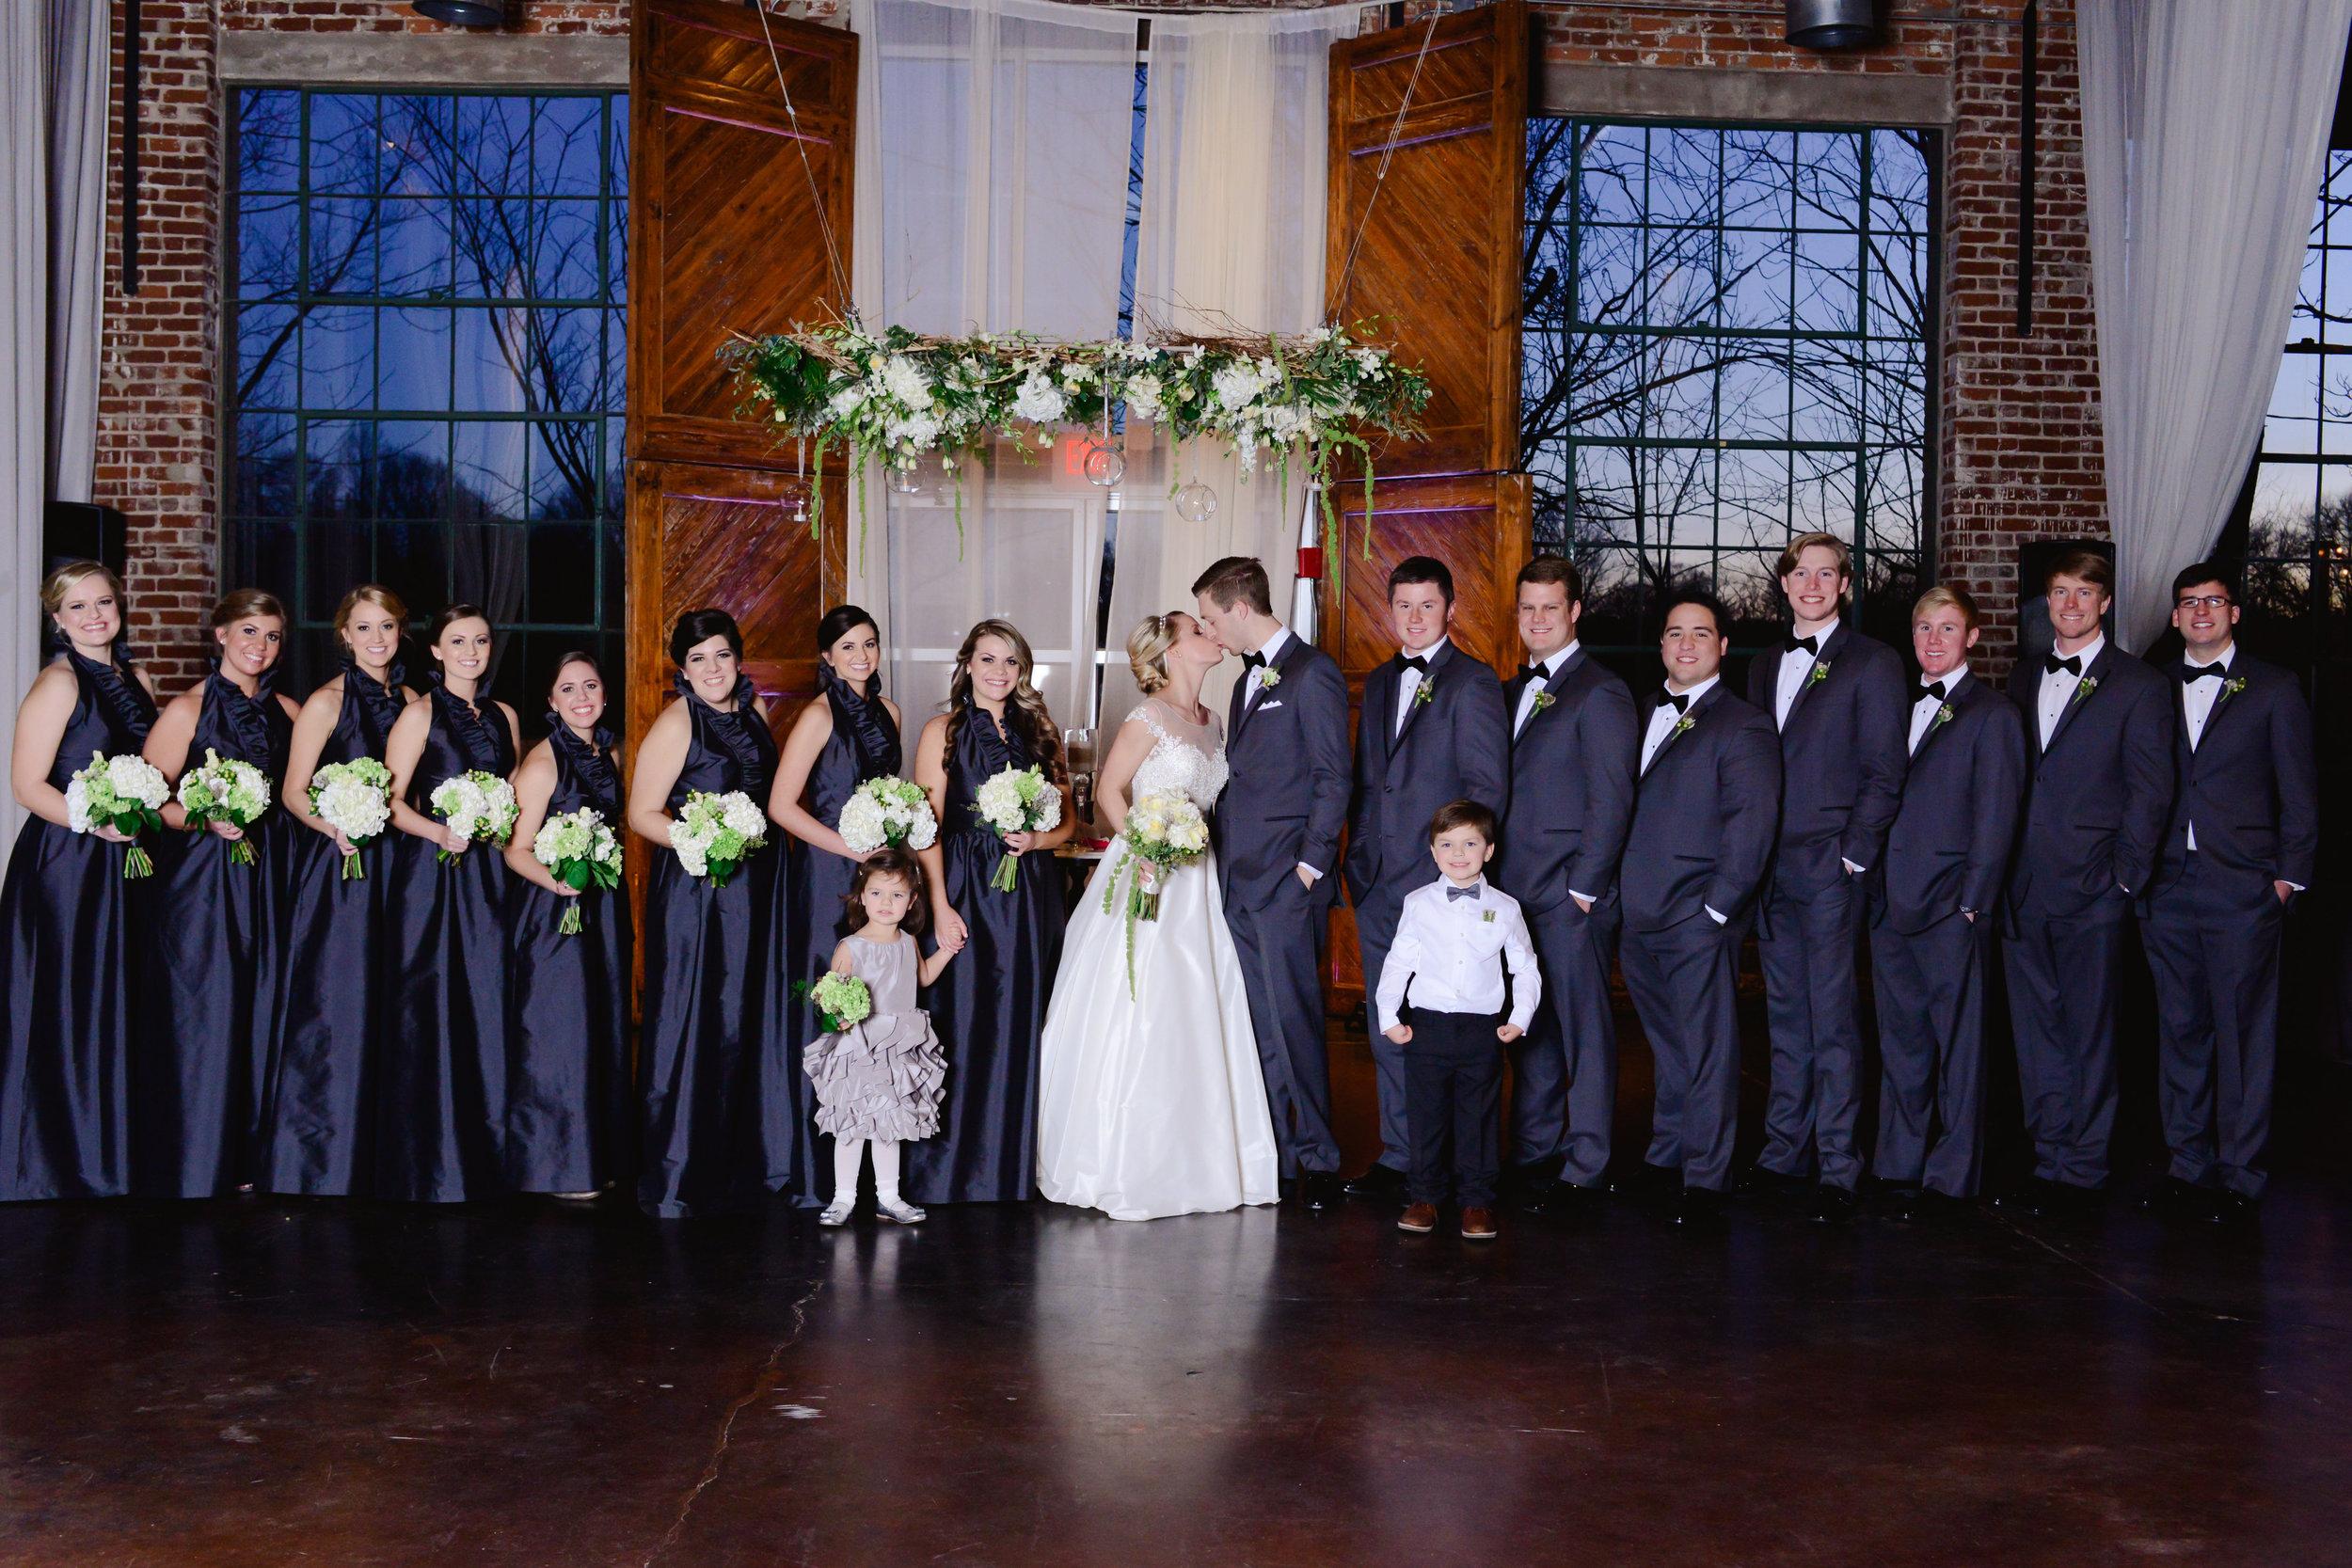 sarah-and-justin-smith-wedding-0407.jpg